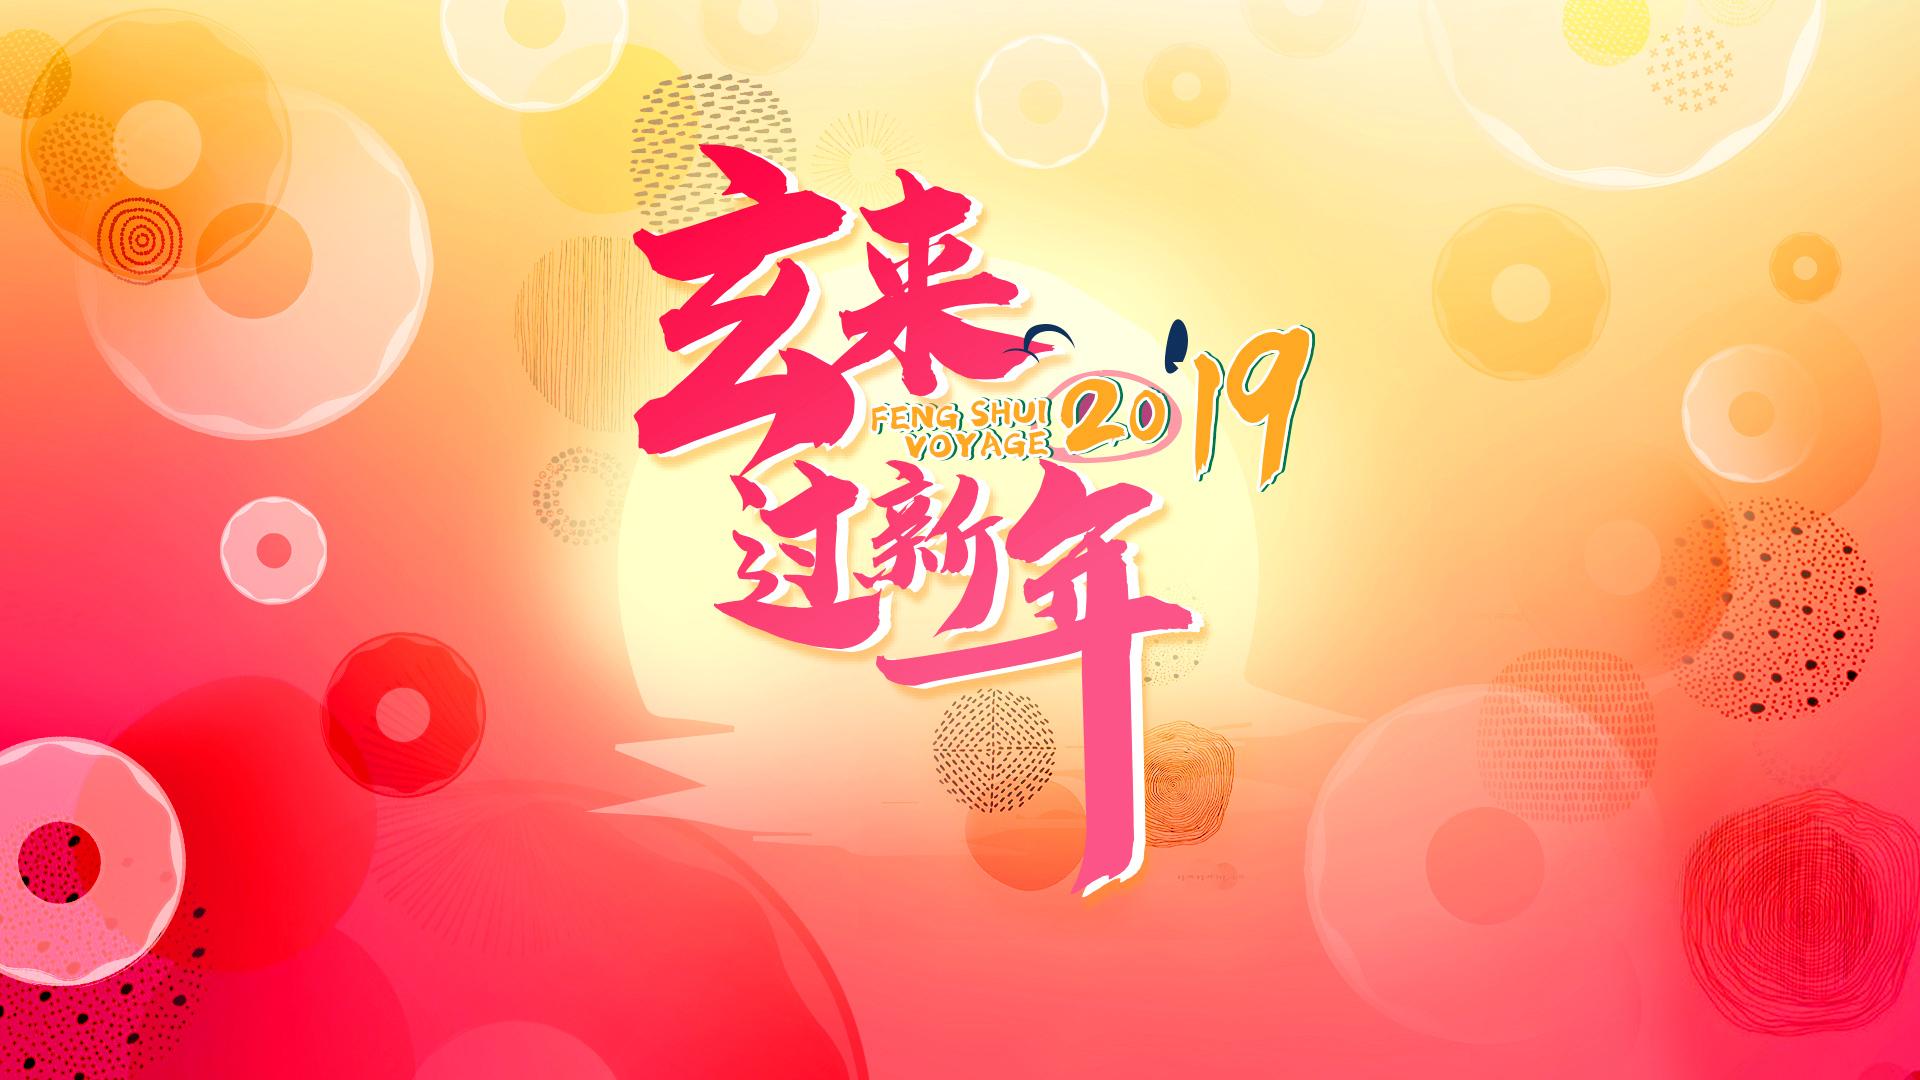 FENG SHUI VOYAGE 2019